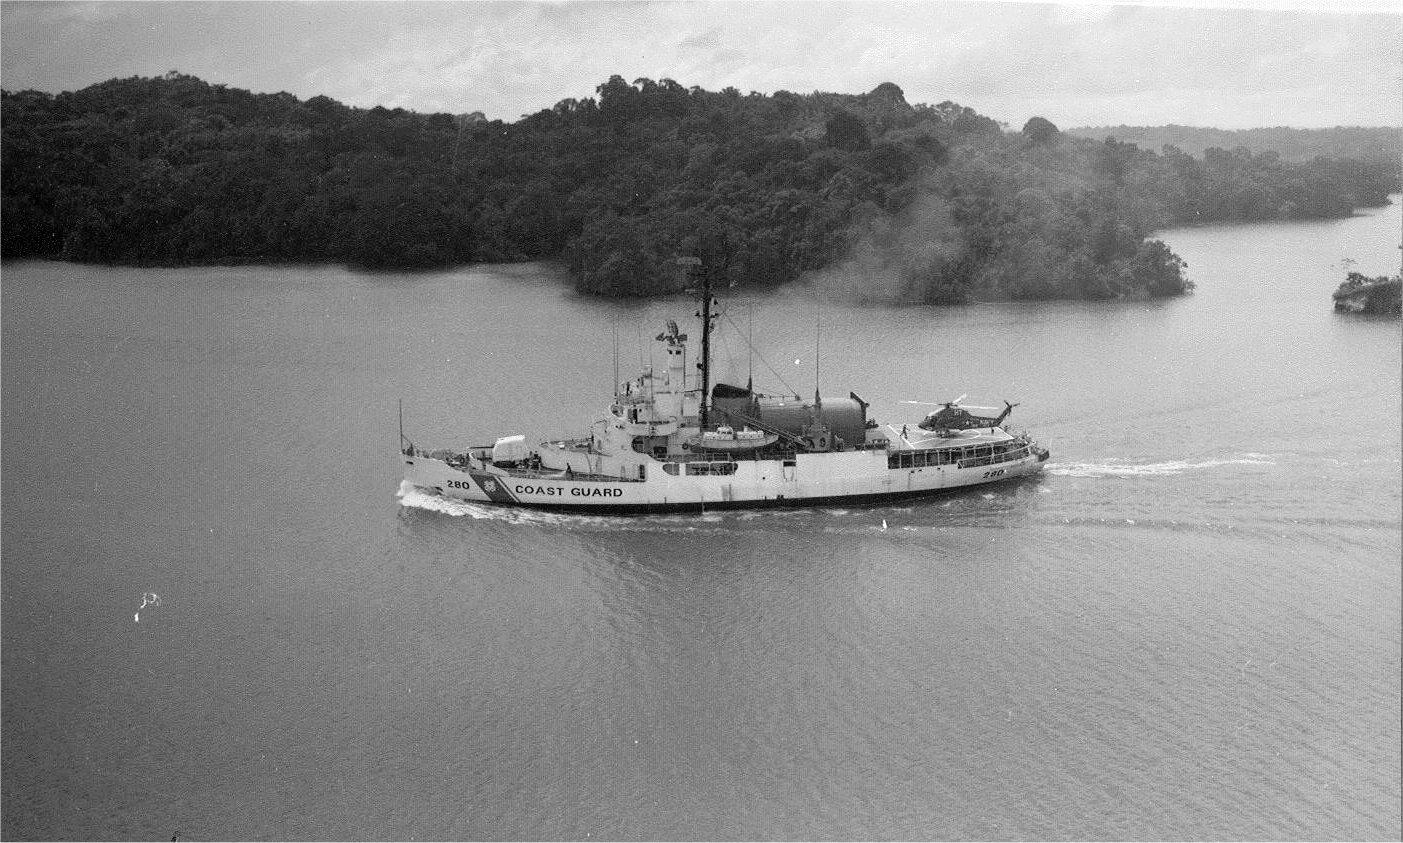 Now-USCGC Southwind (WAGB-280) transits the Panama Canal, 28 November 1967. US Coast Guard Historian's Office photo, copy sheet # 112867-13-16